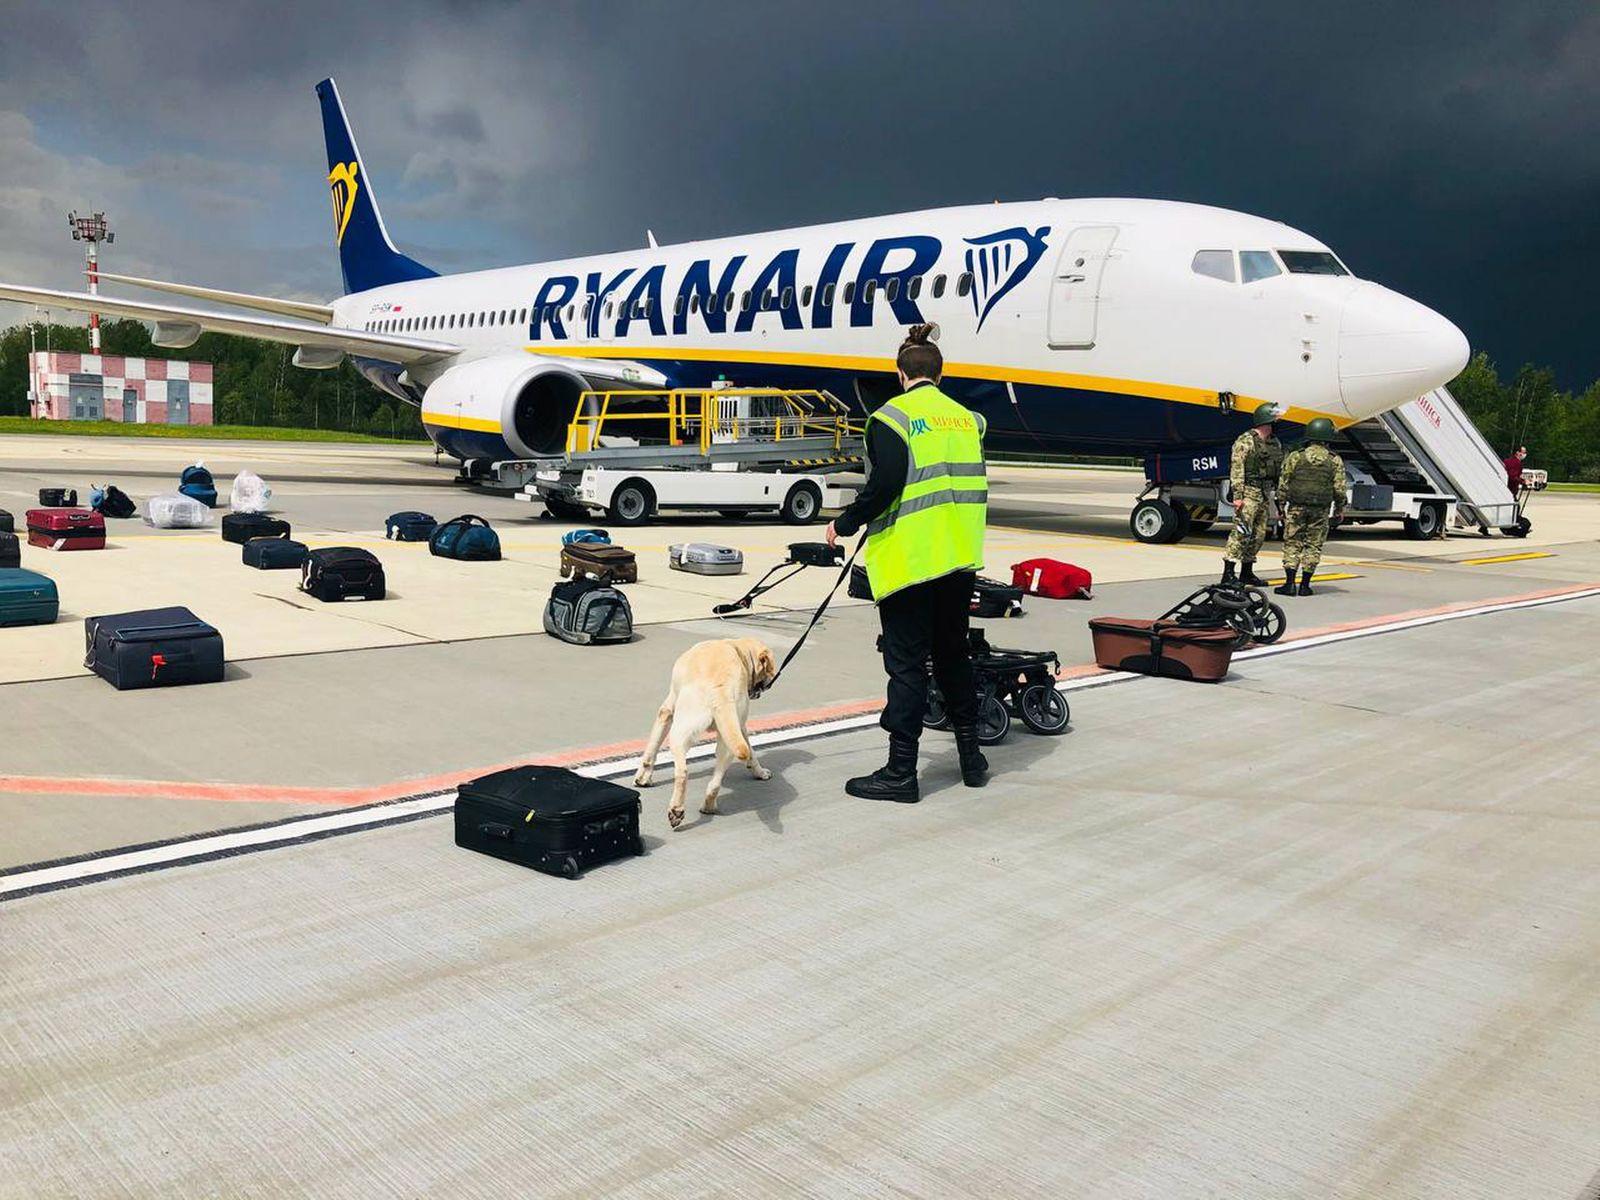 Opposition journalist travelling on Ryanair flight arrested in Minsk